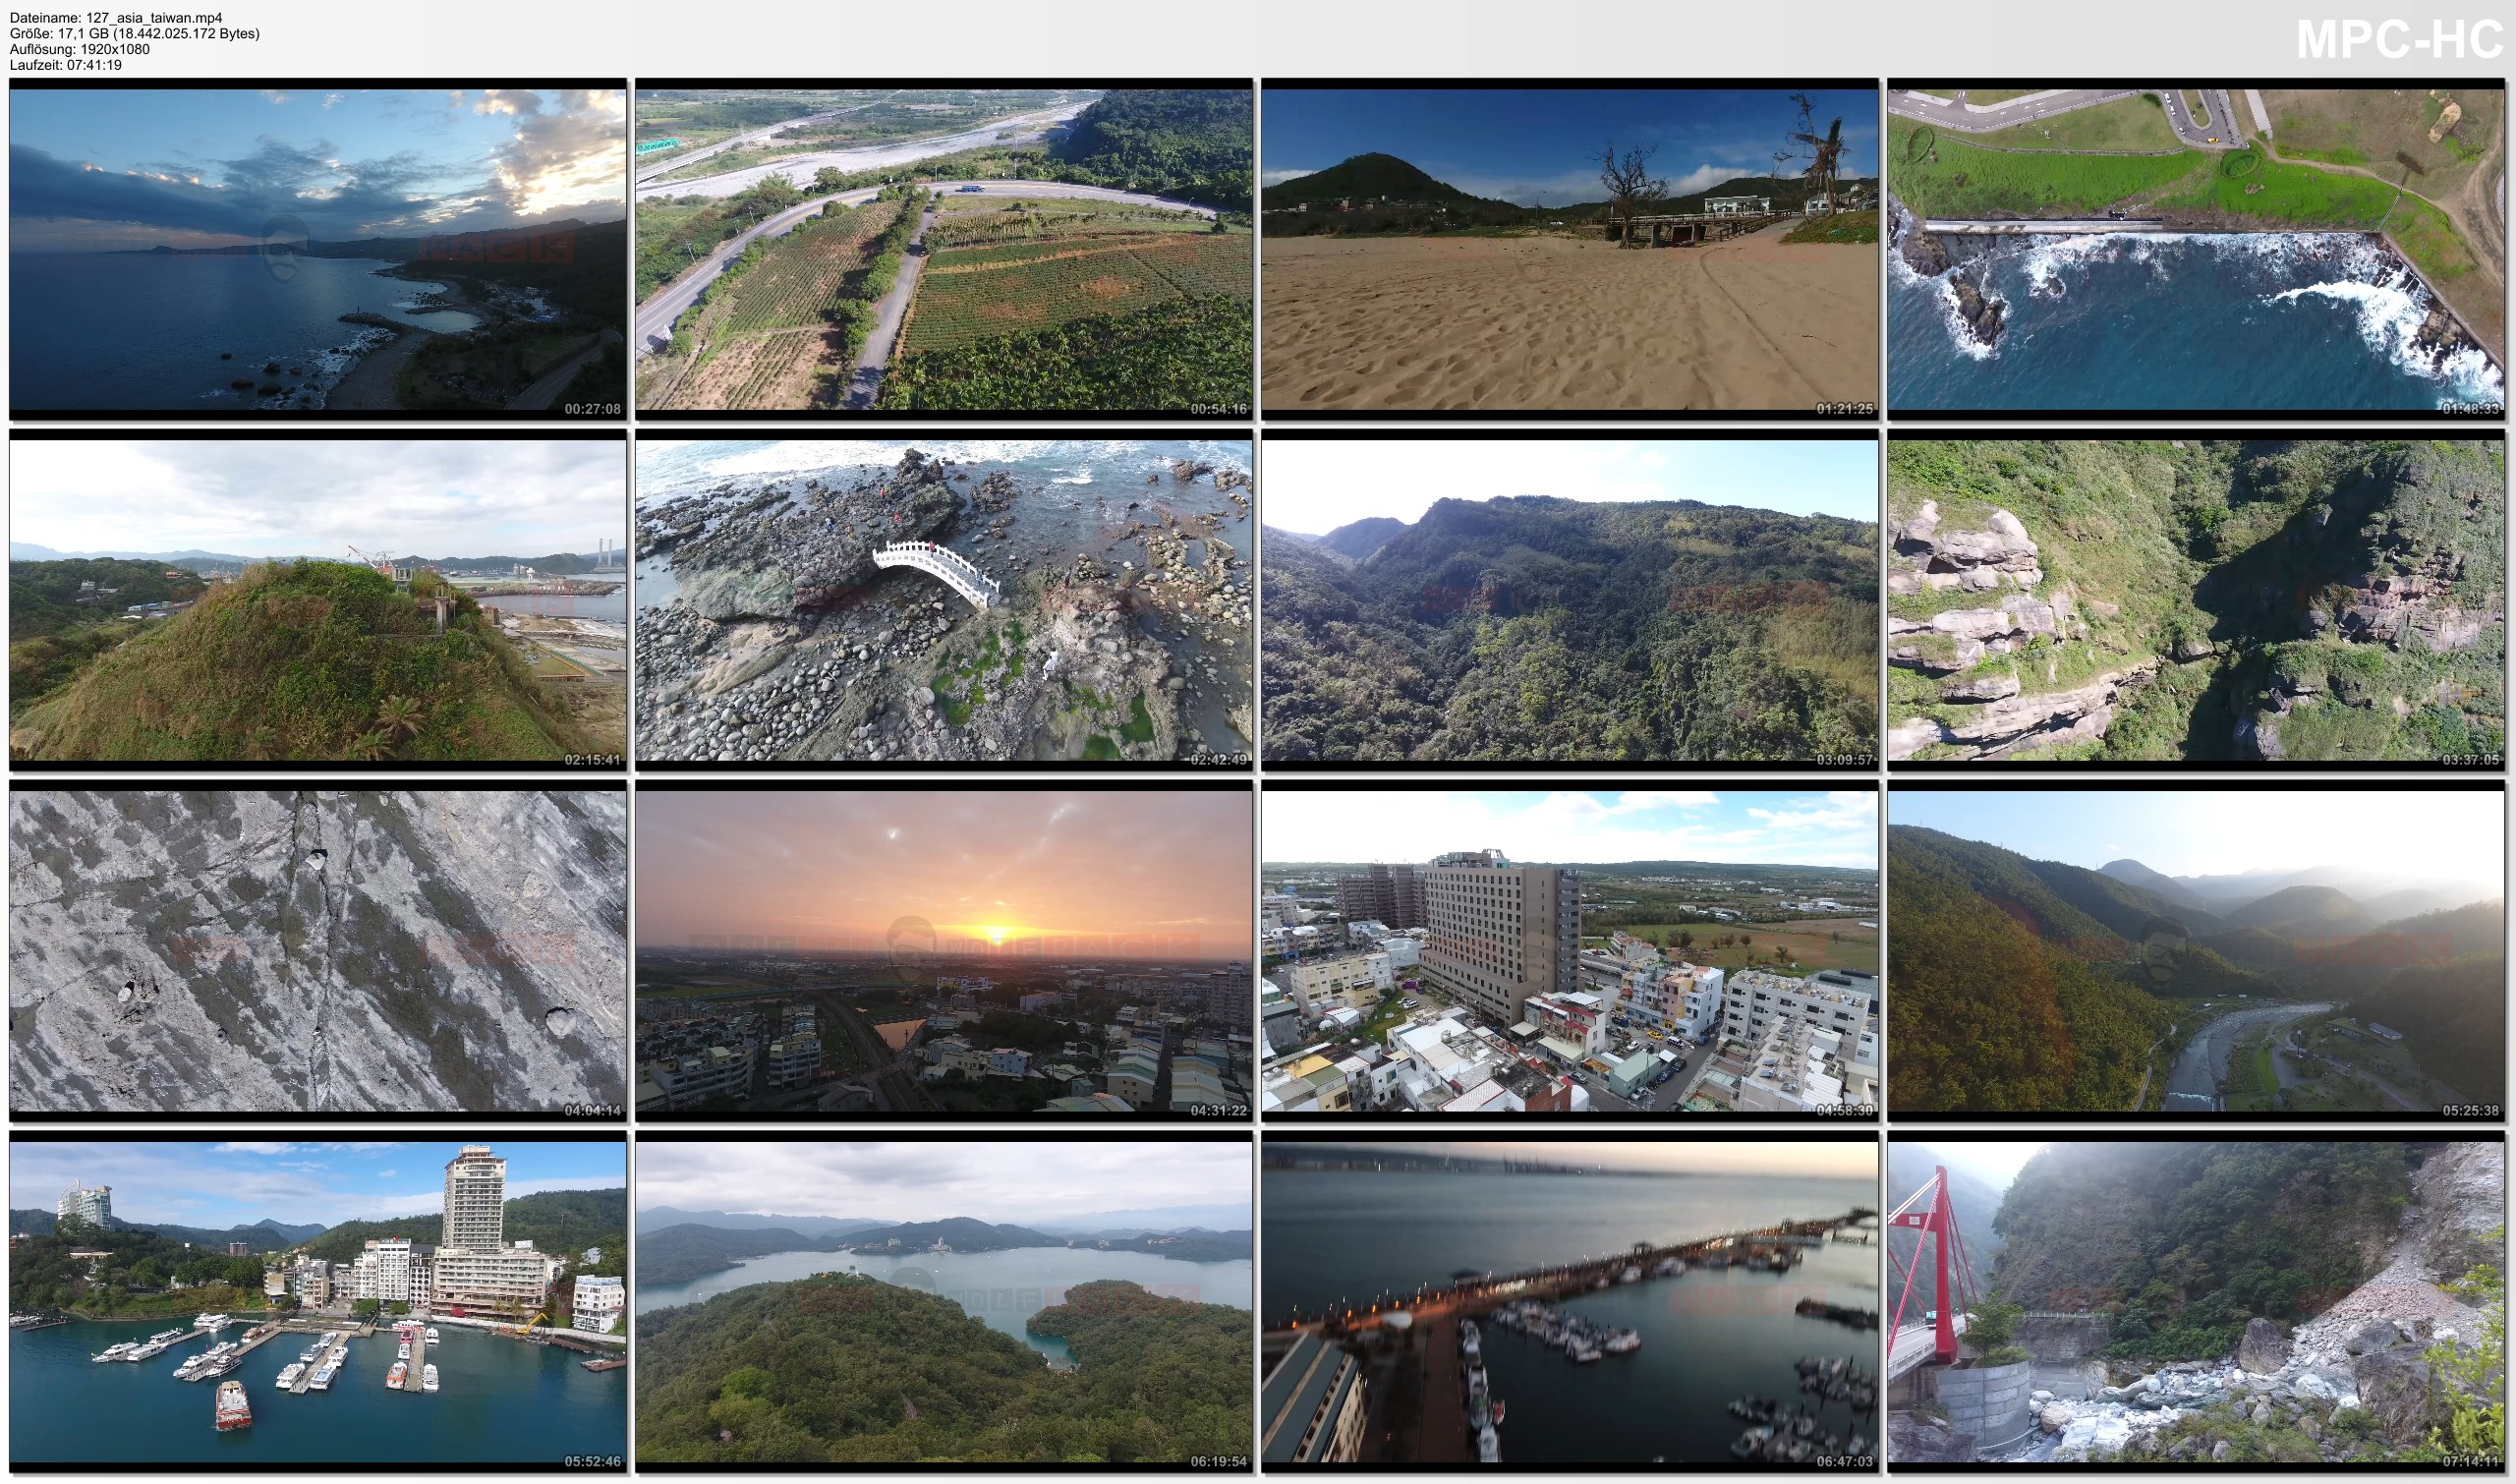 Drone Pictures from Video 【4K】Drone RAW Footage | TAIWAN 2019 ..:: Taroko Gorge :: Sun Moon Lake :: Keelung | UltraHD Video